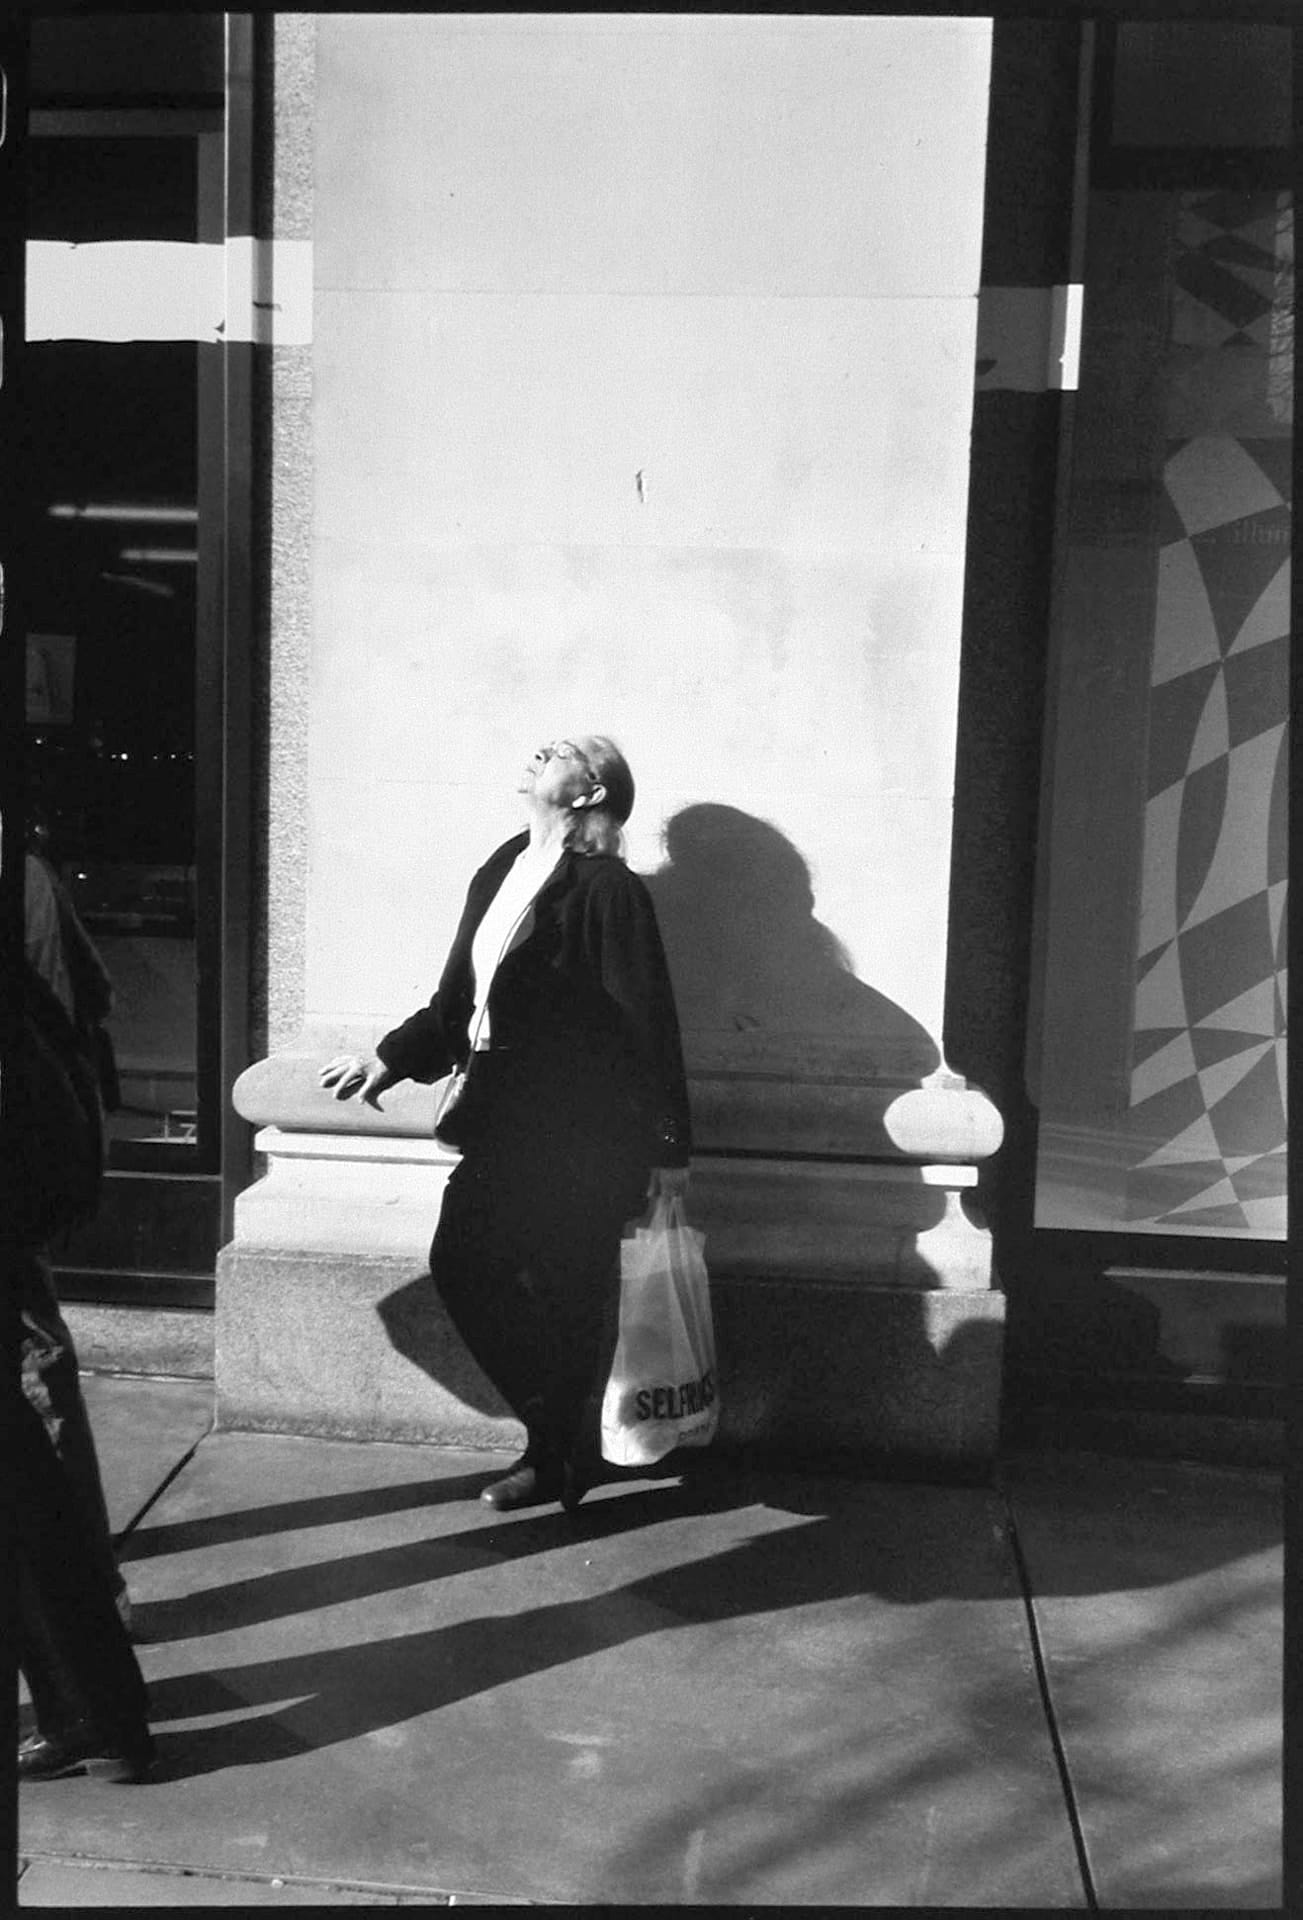 Selfridge's, London 2003